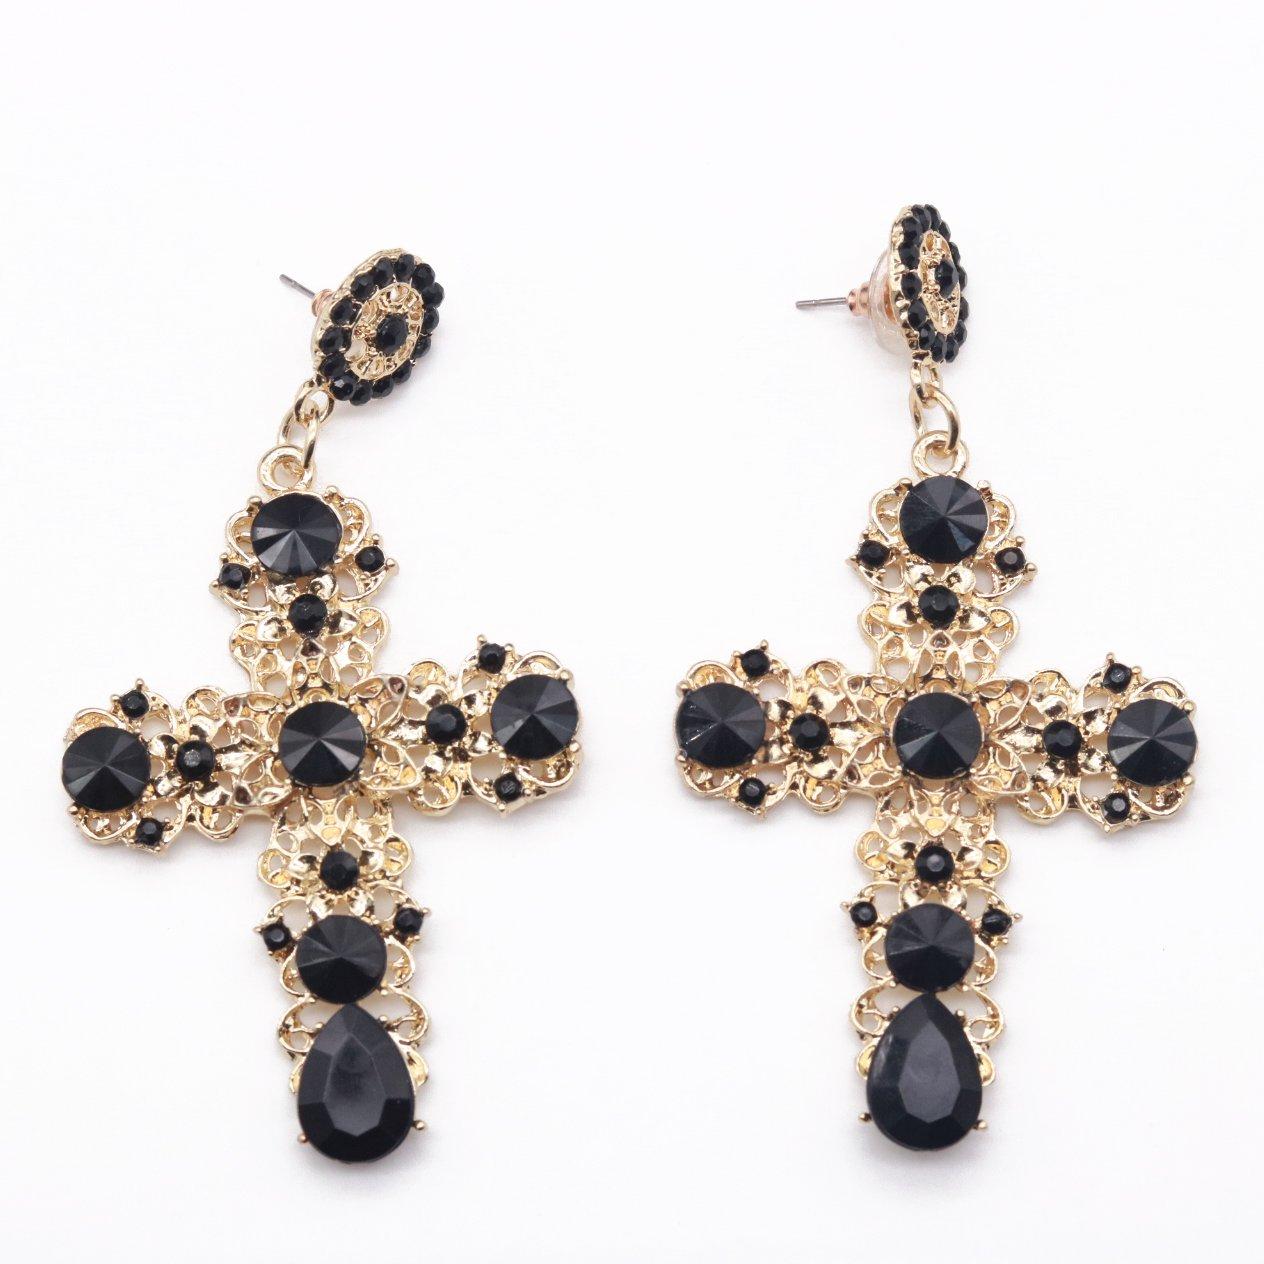 Kercisbeauty Boho Halo Chapel Cross Pendant Earrings Studs with Rhinestones Dangles for Women and Teen Girls, Back to School Halloween Party